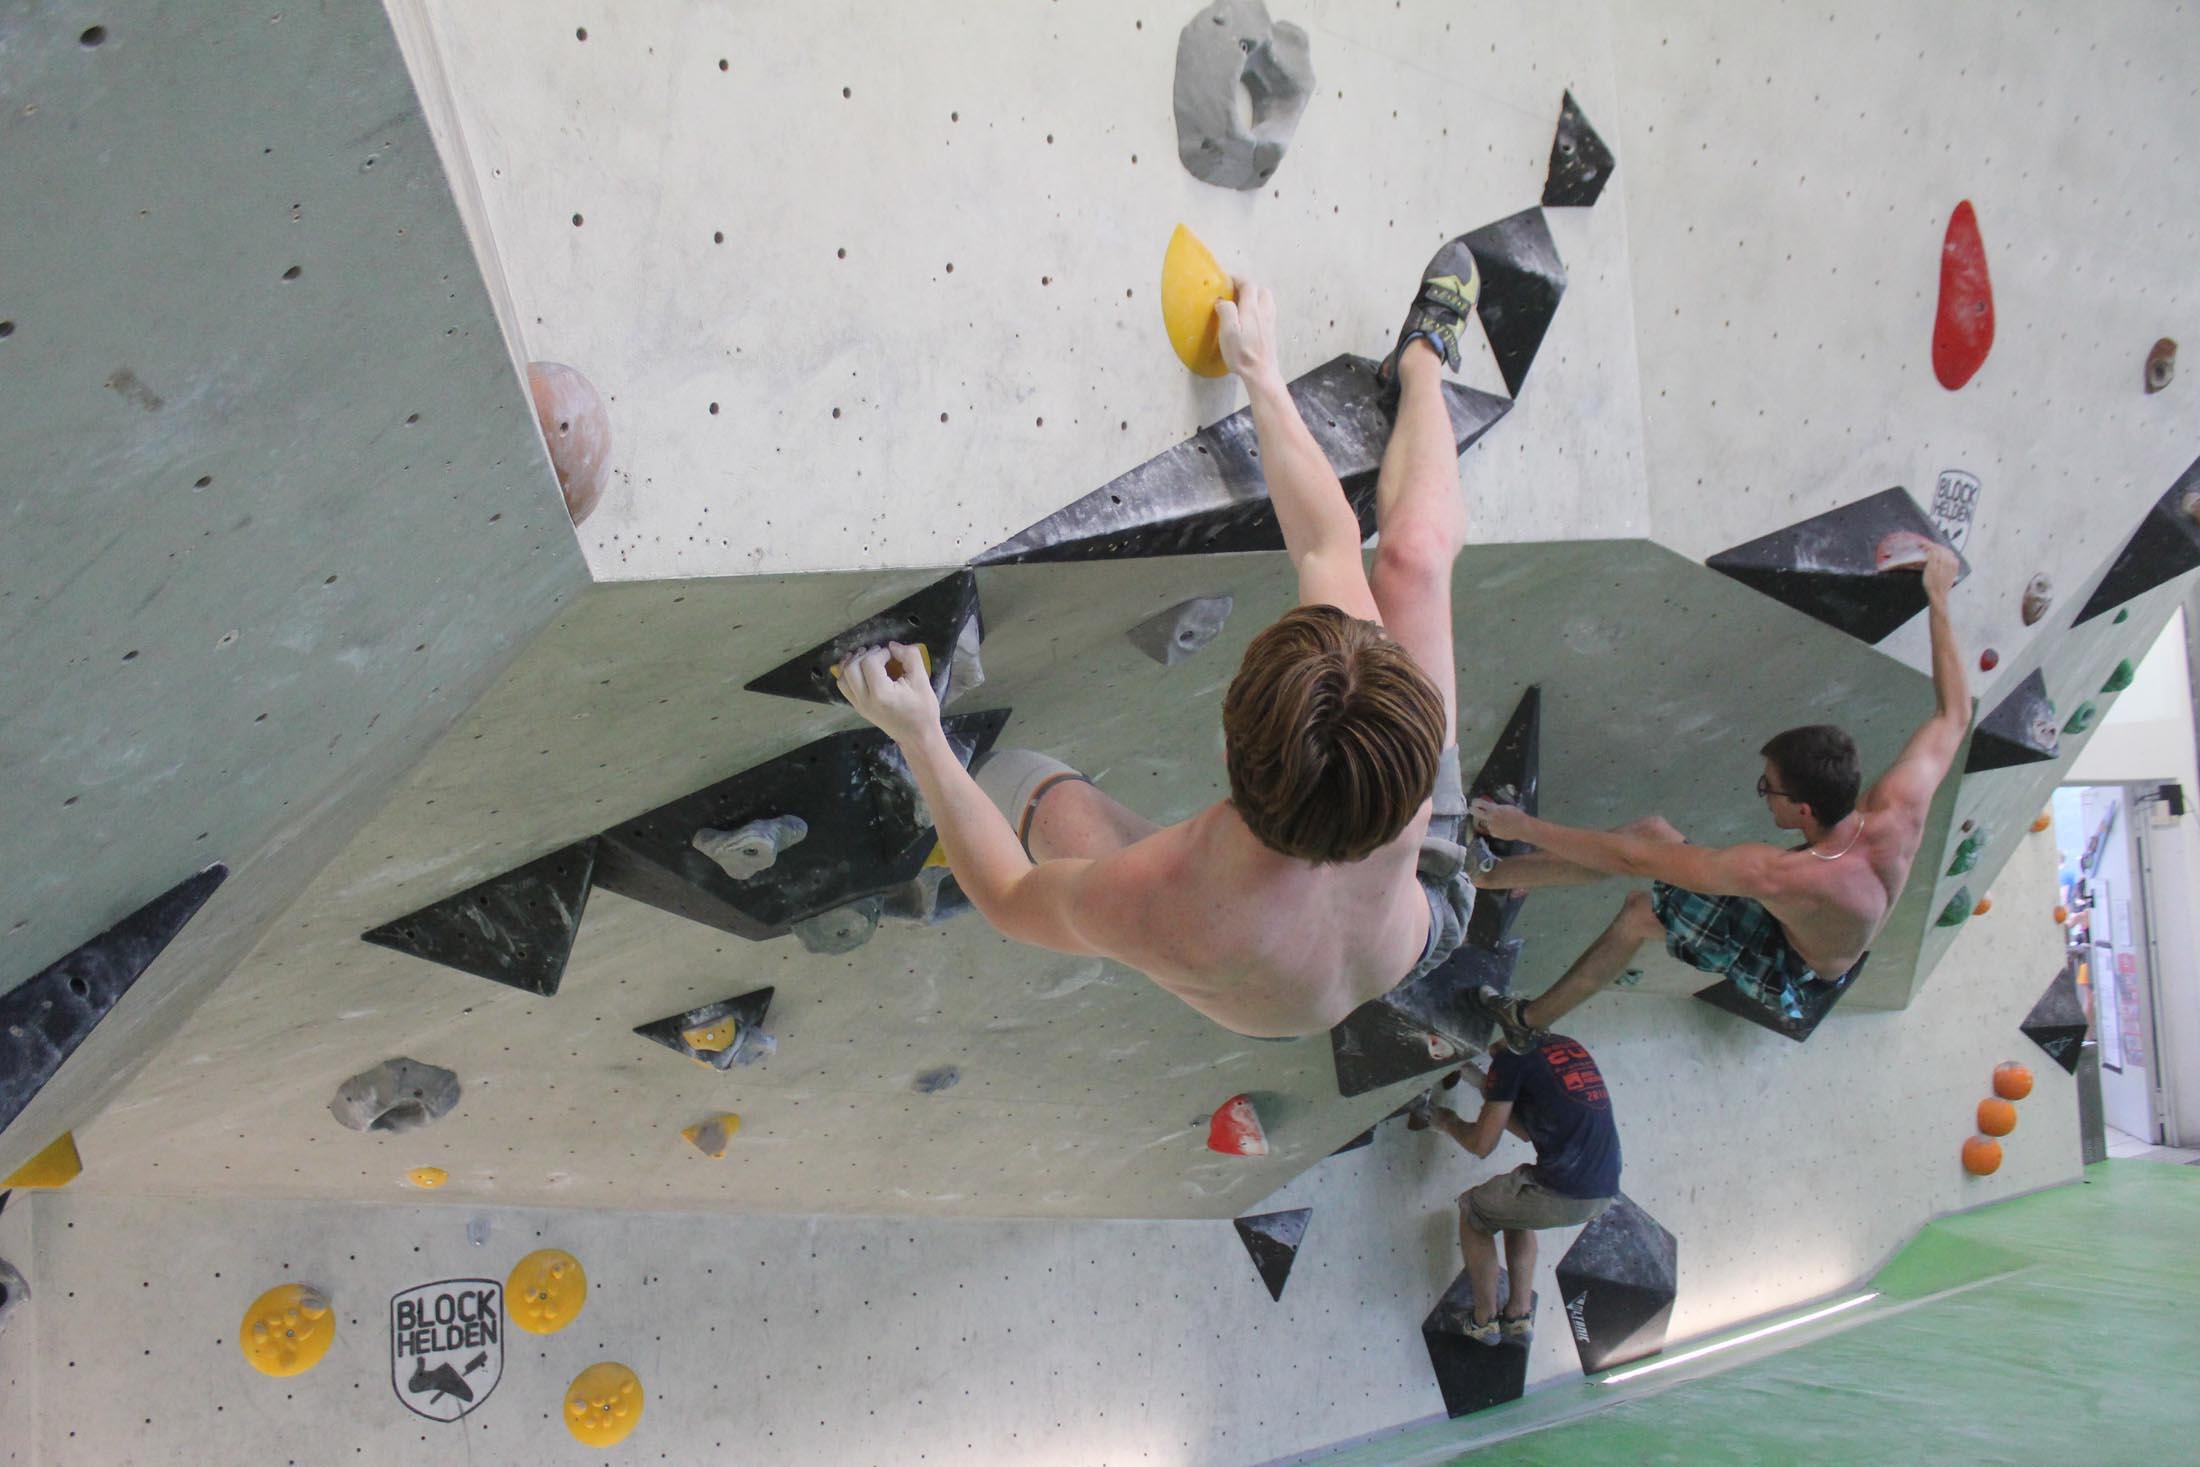 Quali, internationaler bouldercup Frankenjura 2016, BLOCKHELDEN Erlangen, Mammut, Bergfreunde.de, Boulderwettkampf07092016272